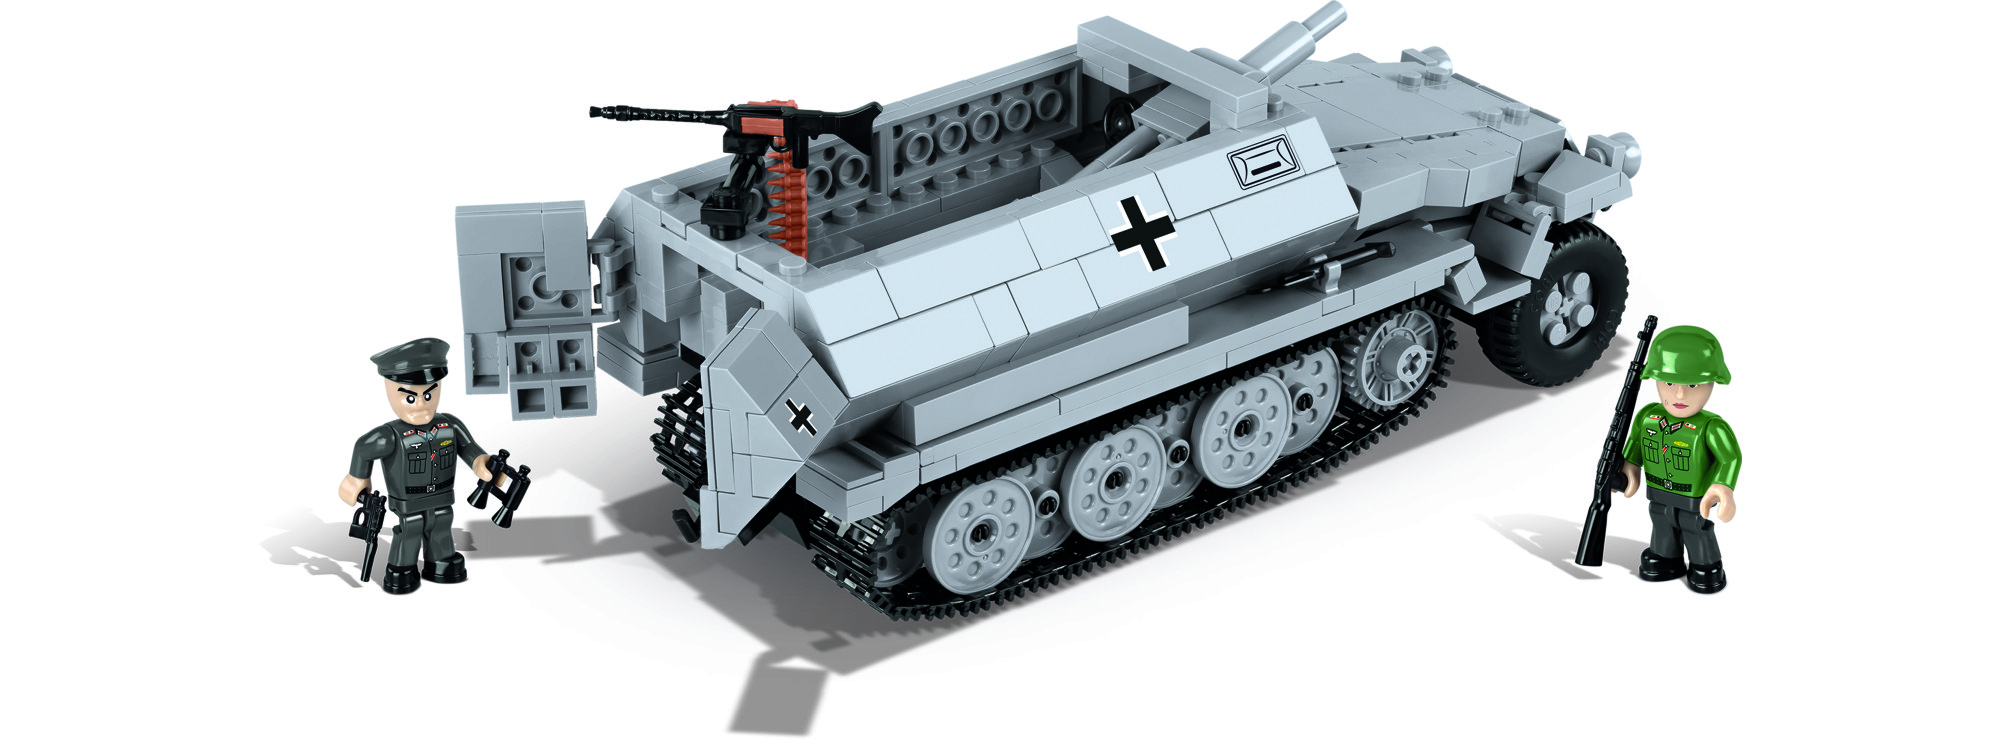 Cobi 2472a Sdkfz 2519 Ausf C Stummel Mod 1942 Panzer